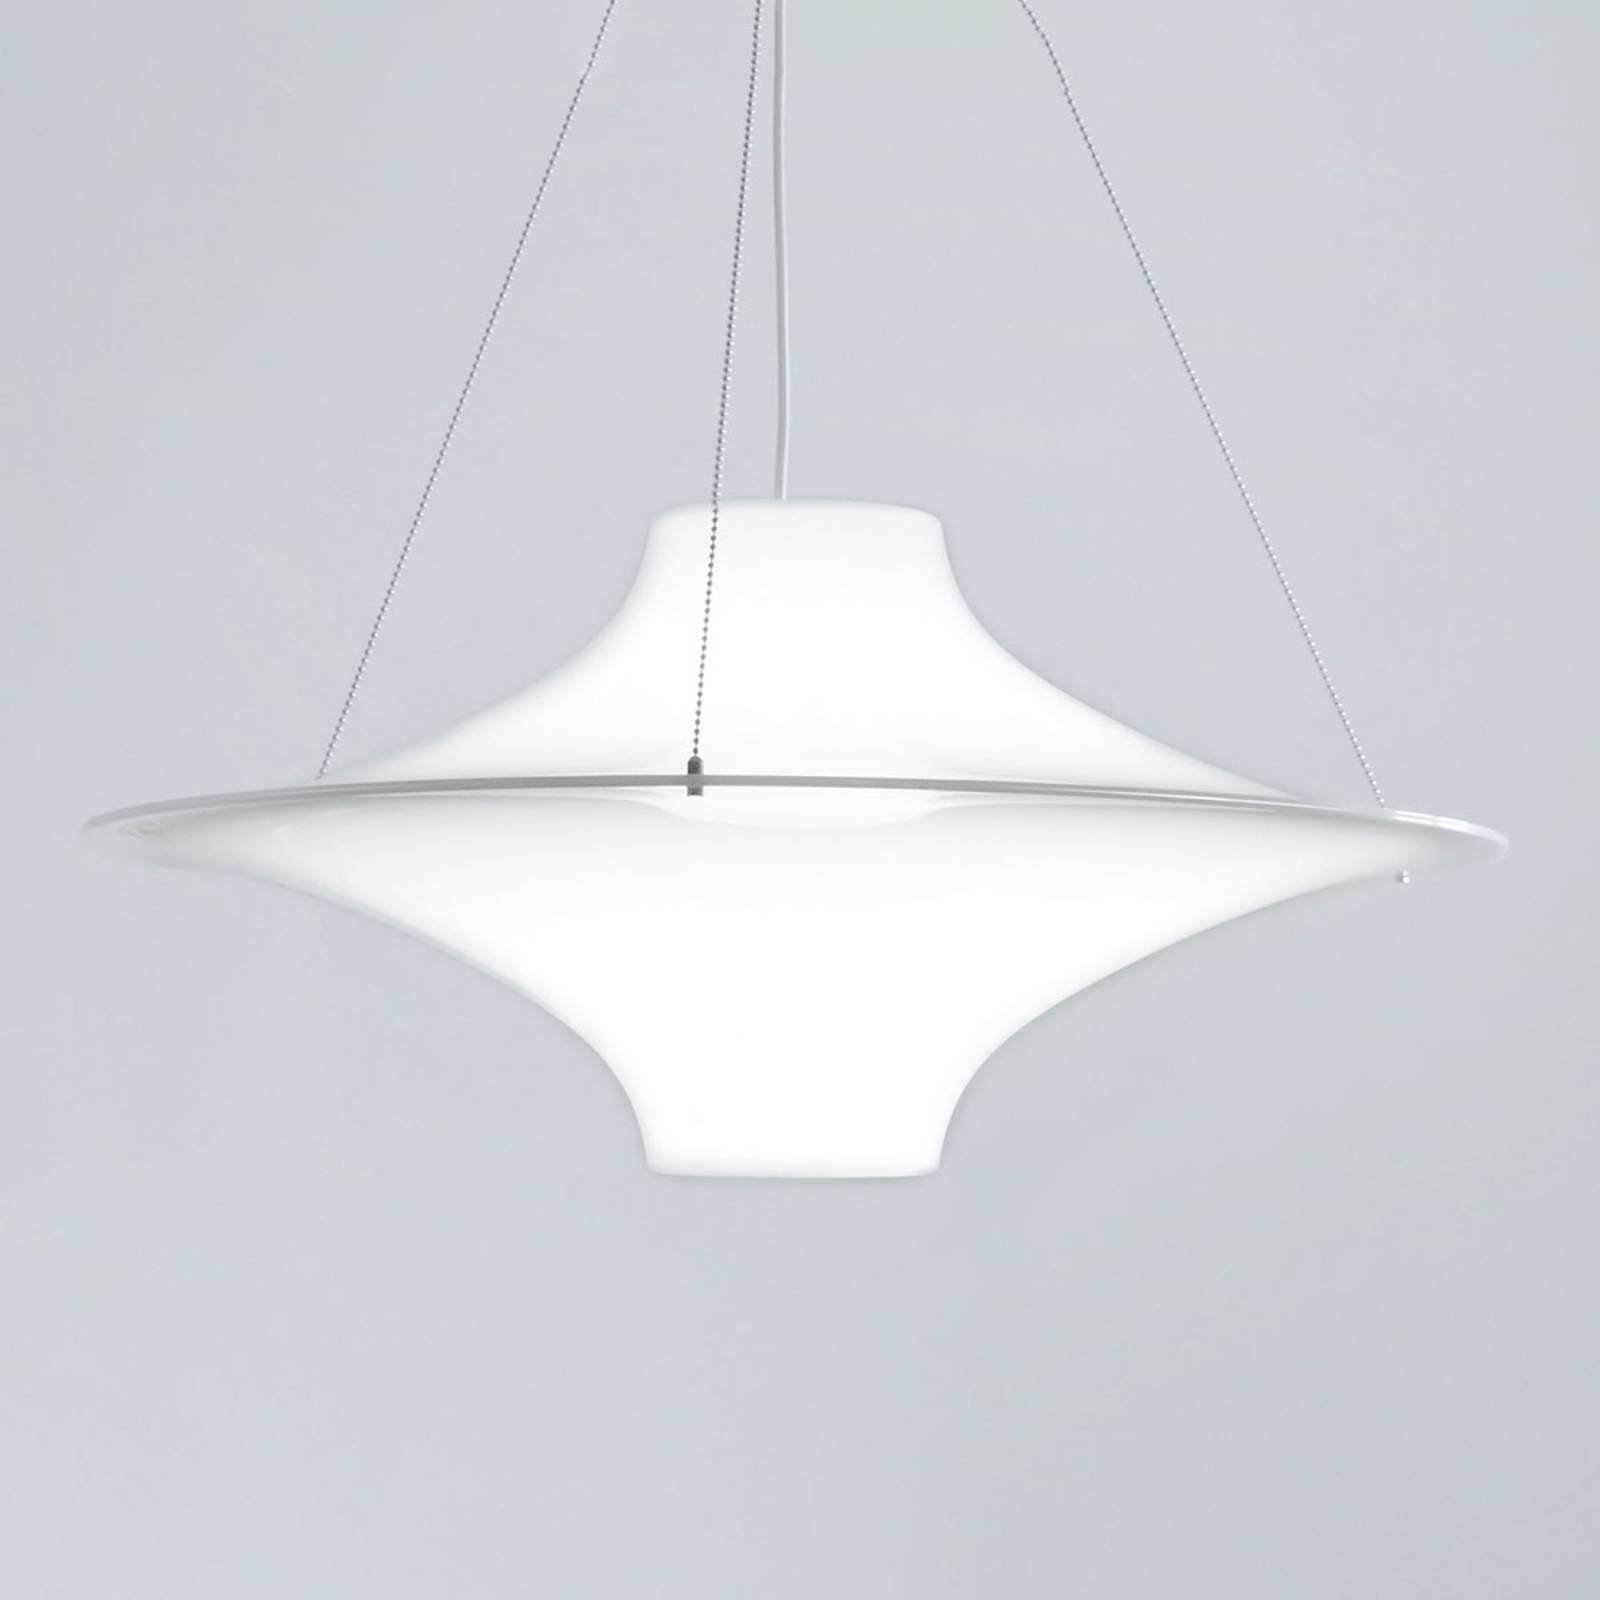 Innolux Lokki designer-hengelampe, 70 cm